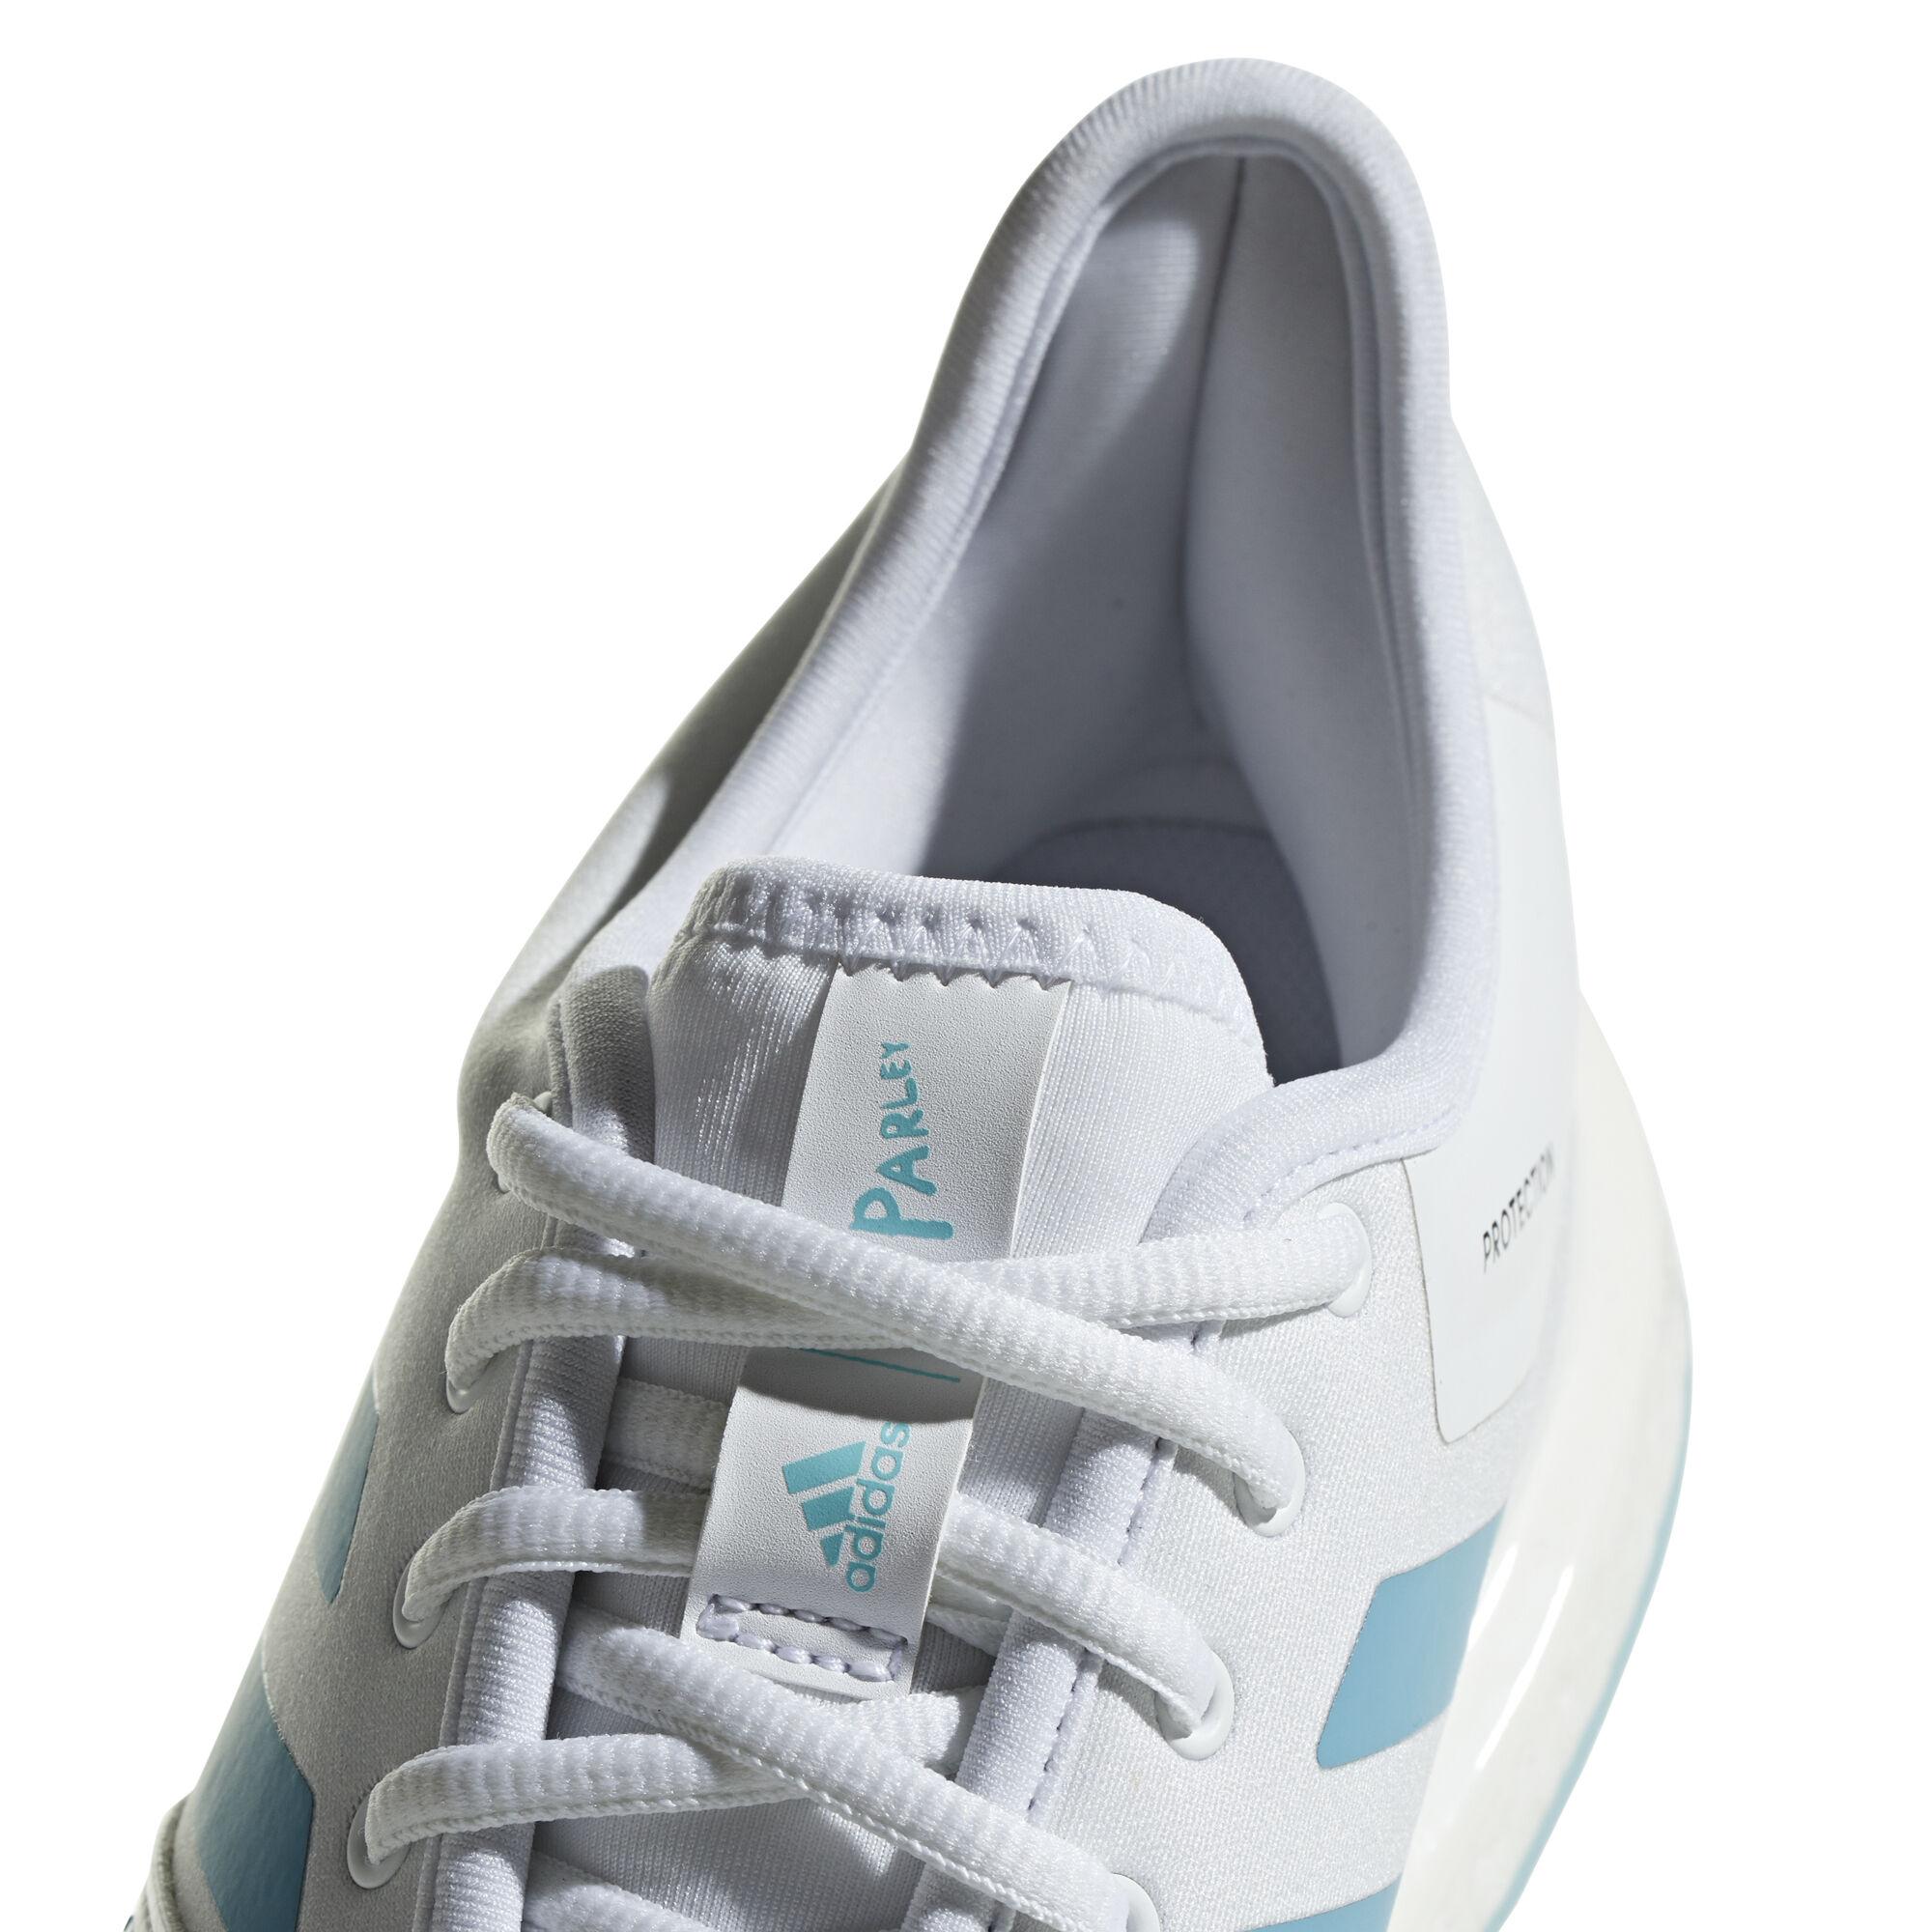 Terrain Parley Adidas Tout Hommes Boost X Chaussure Solecourt 5jLAR34